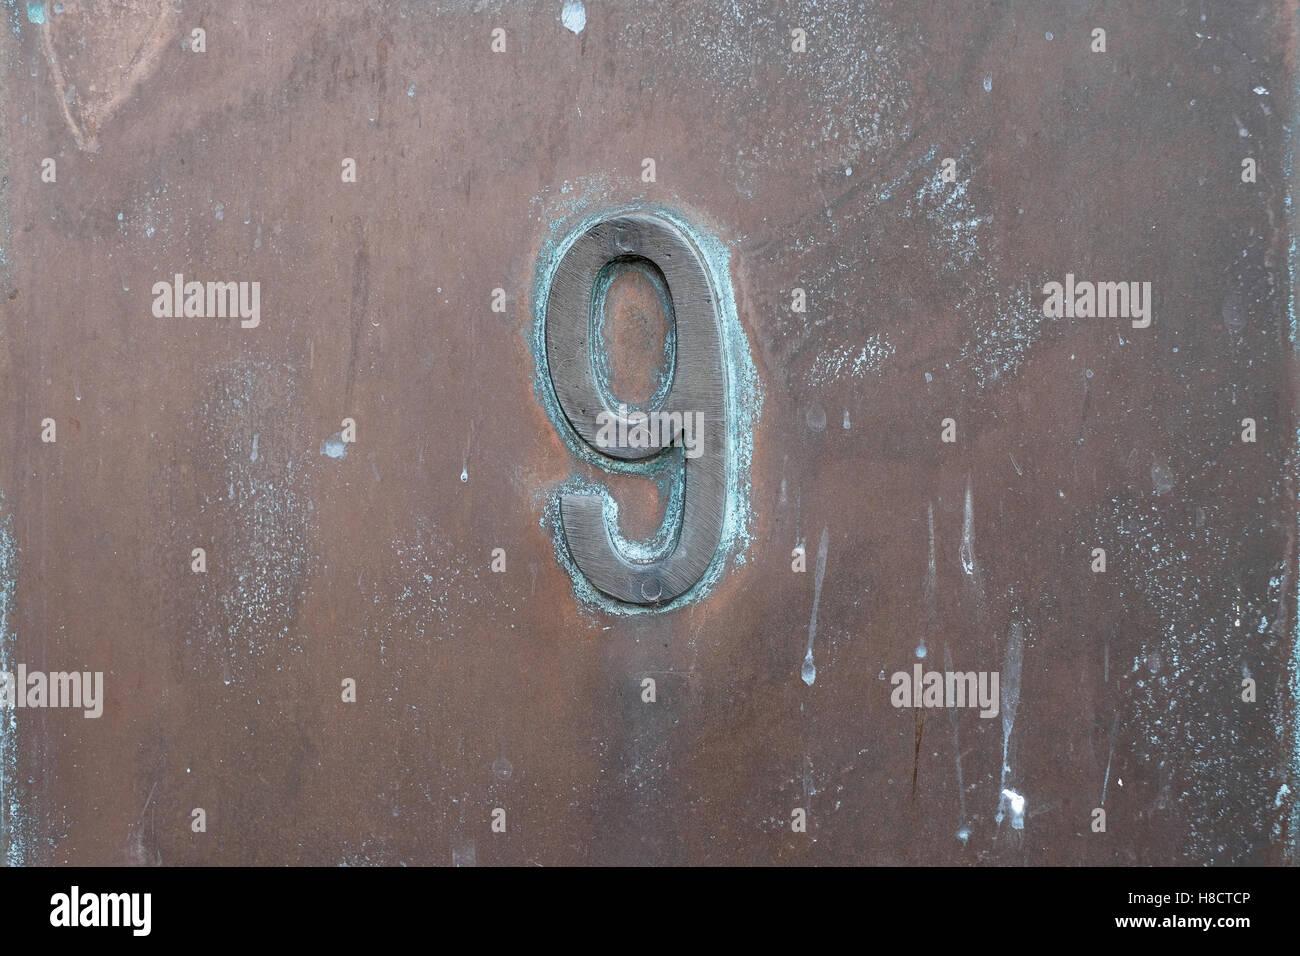 Nummer neun in Metall, 9 Stockbild